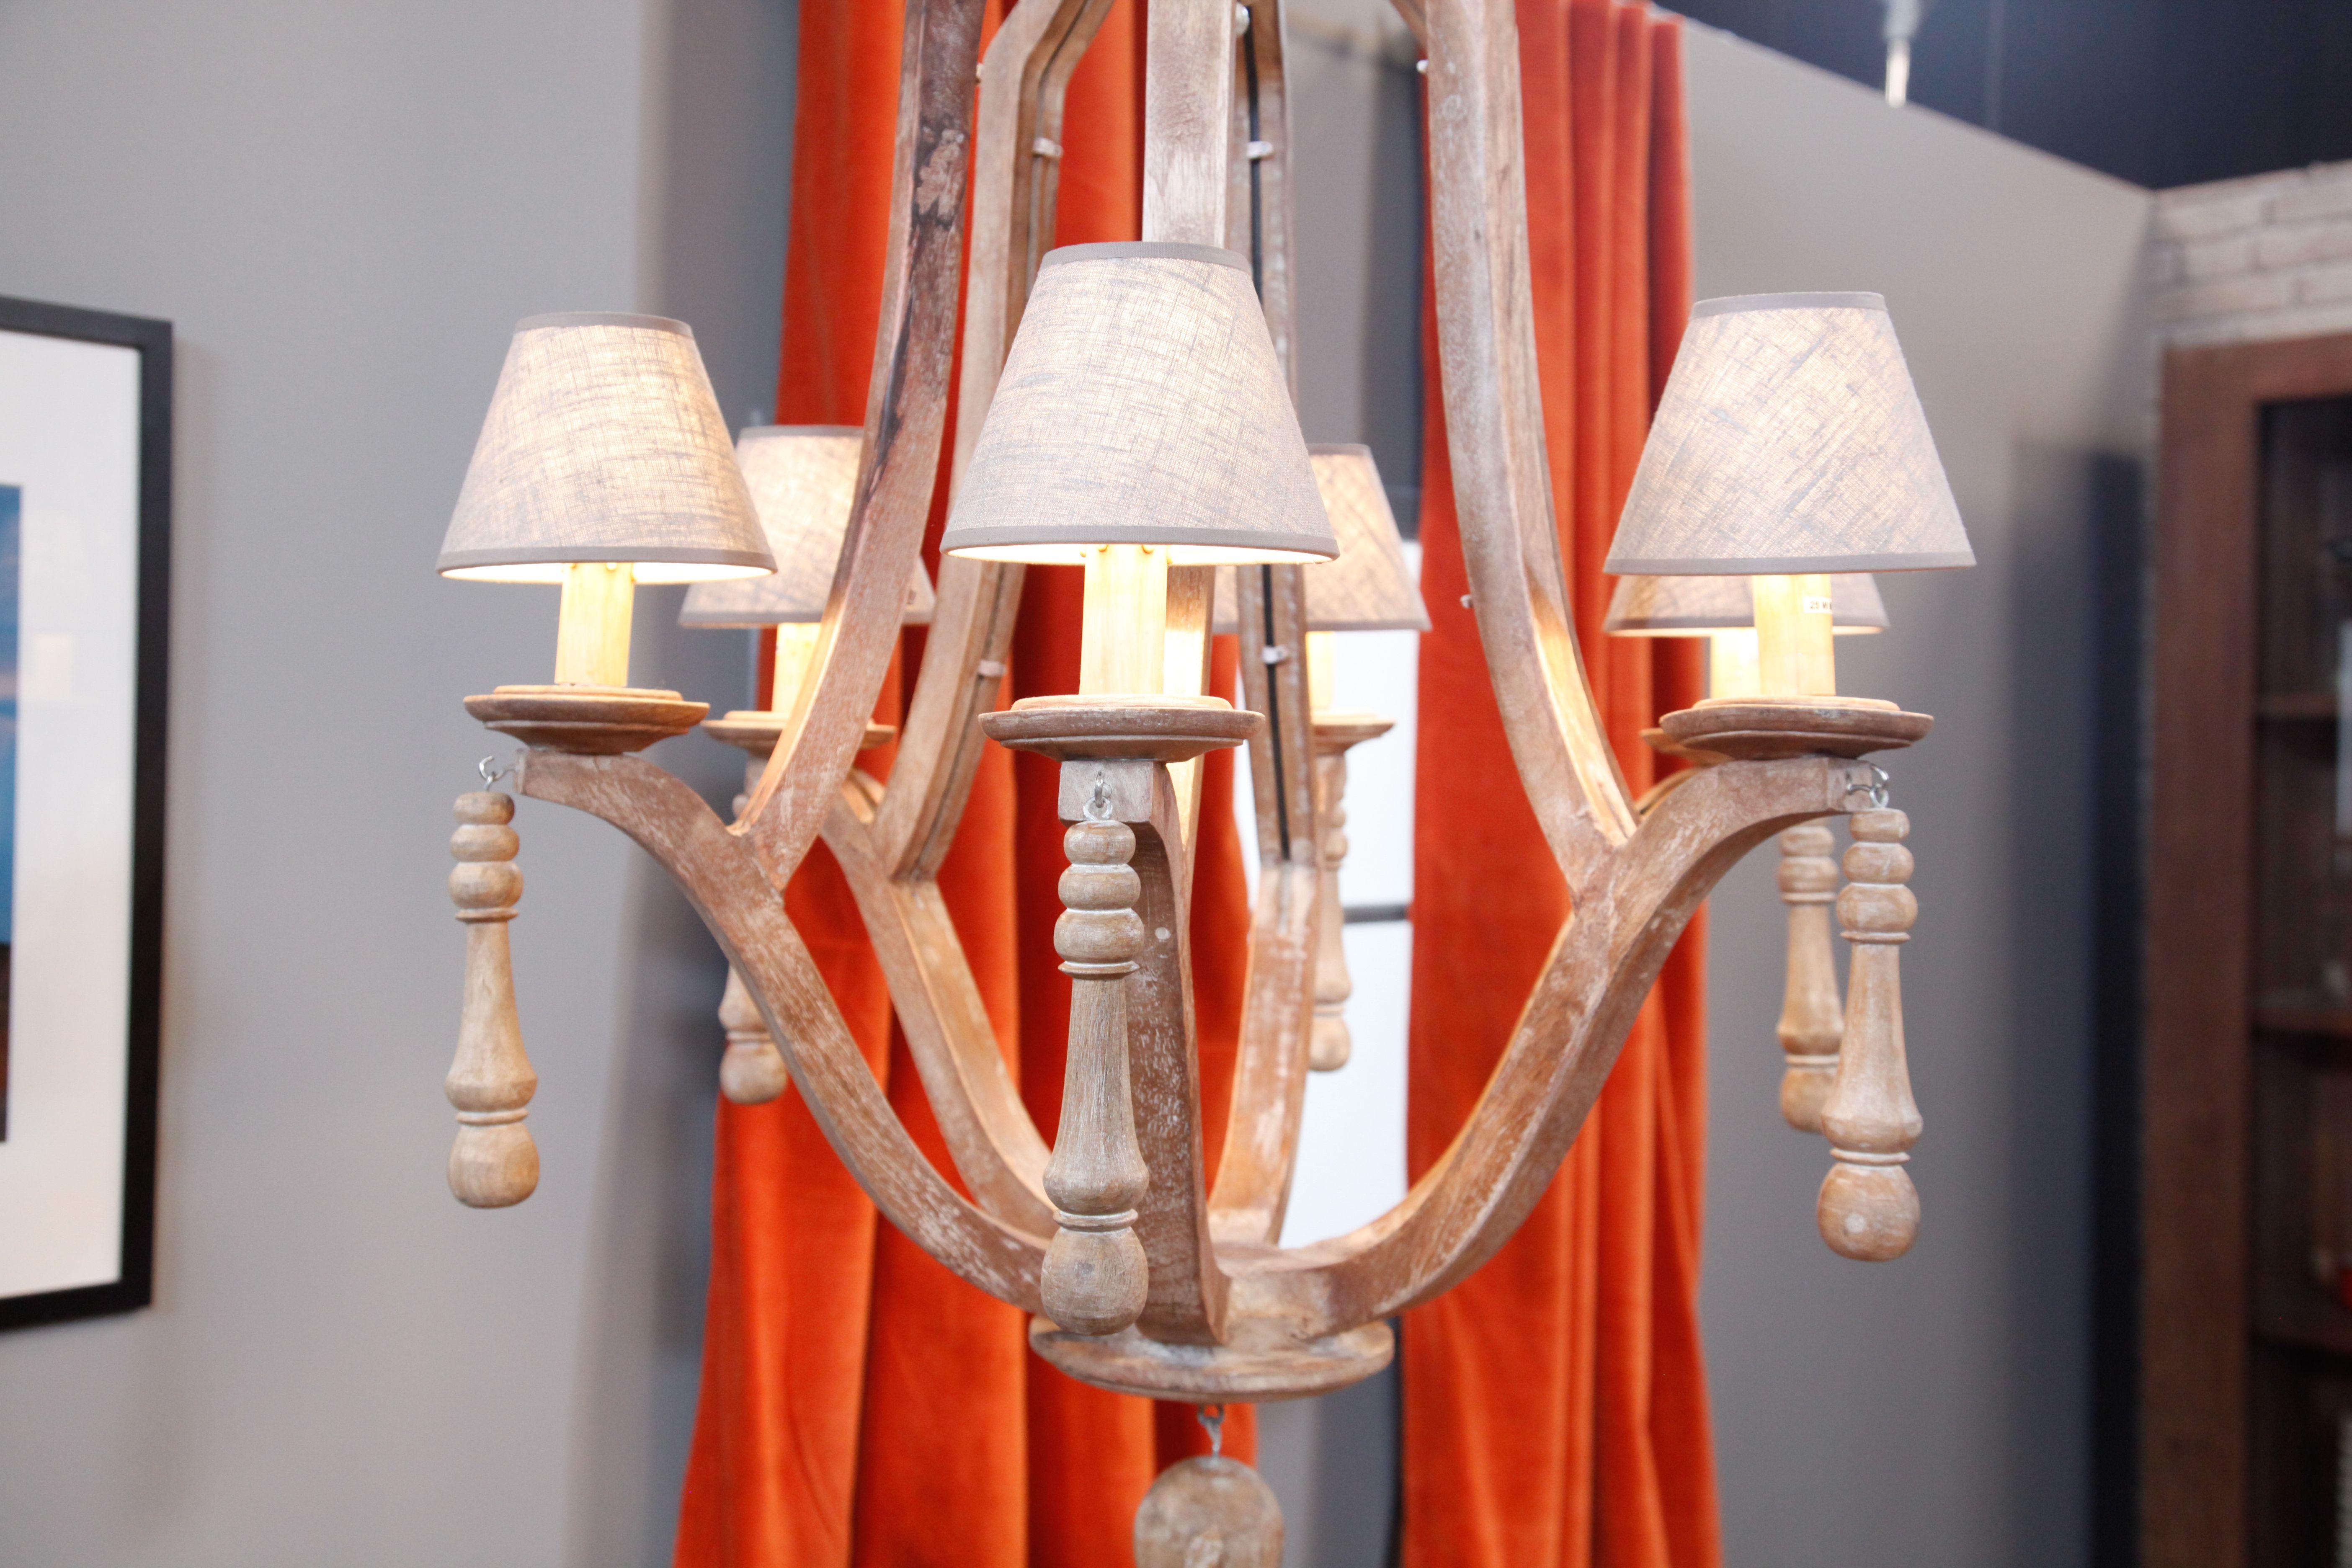 lustre flamant mod le martello tevadeco teva deco campagne chic salon robinclouet t va. Black Bedroom Furniture Sets. Home Design Ideas